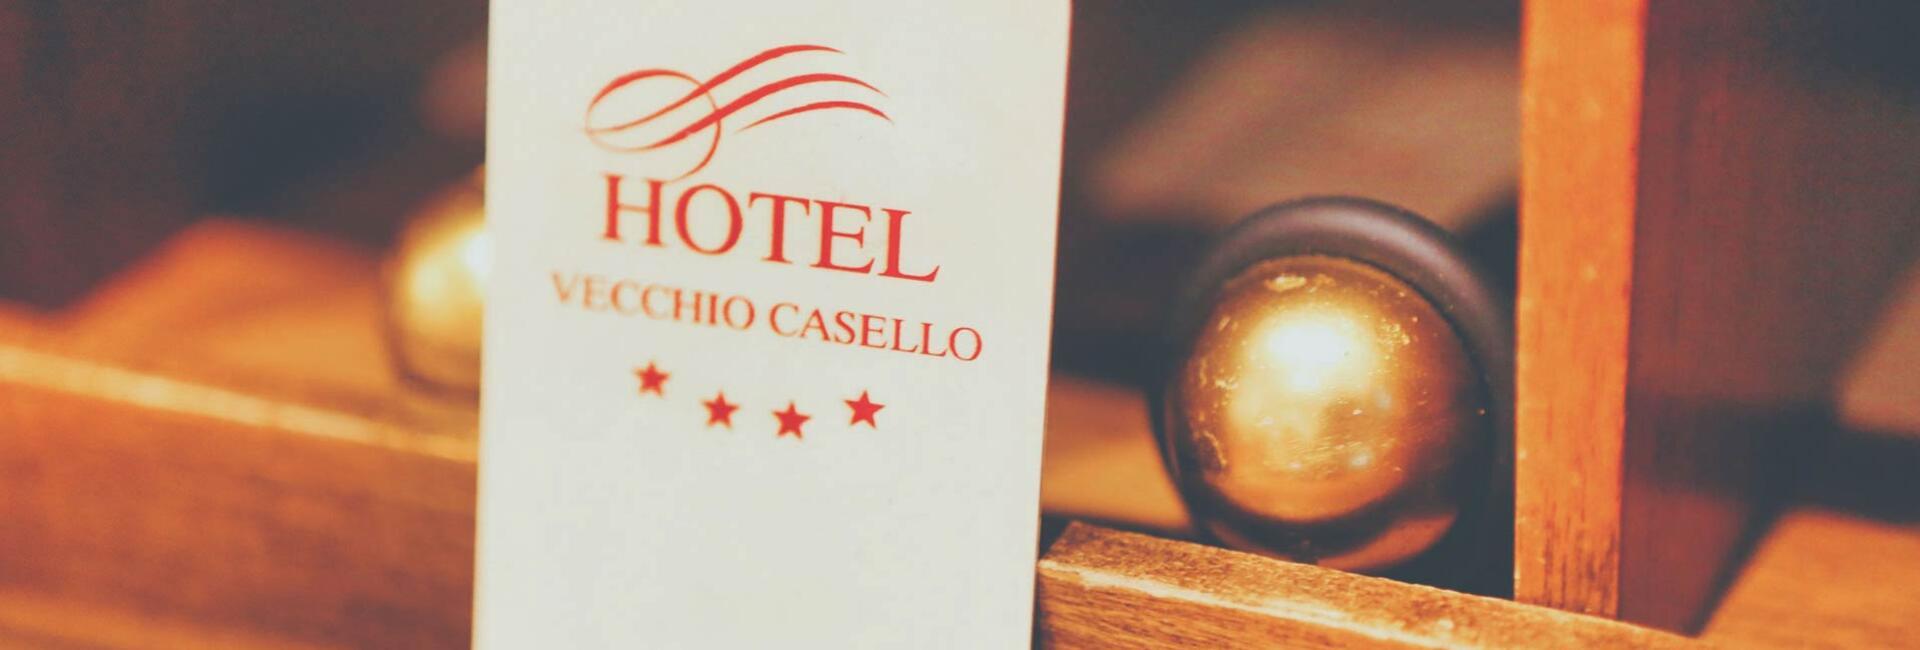 hotelilvecchiocasello en offers 002